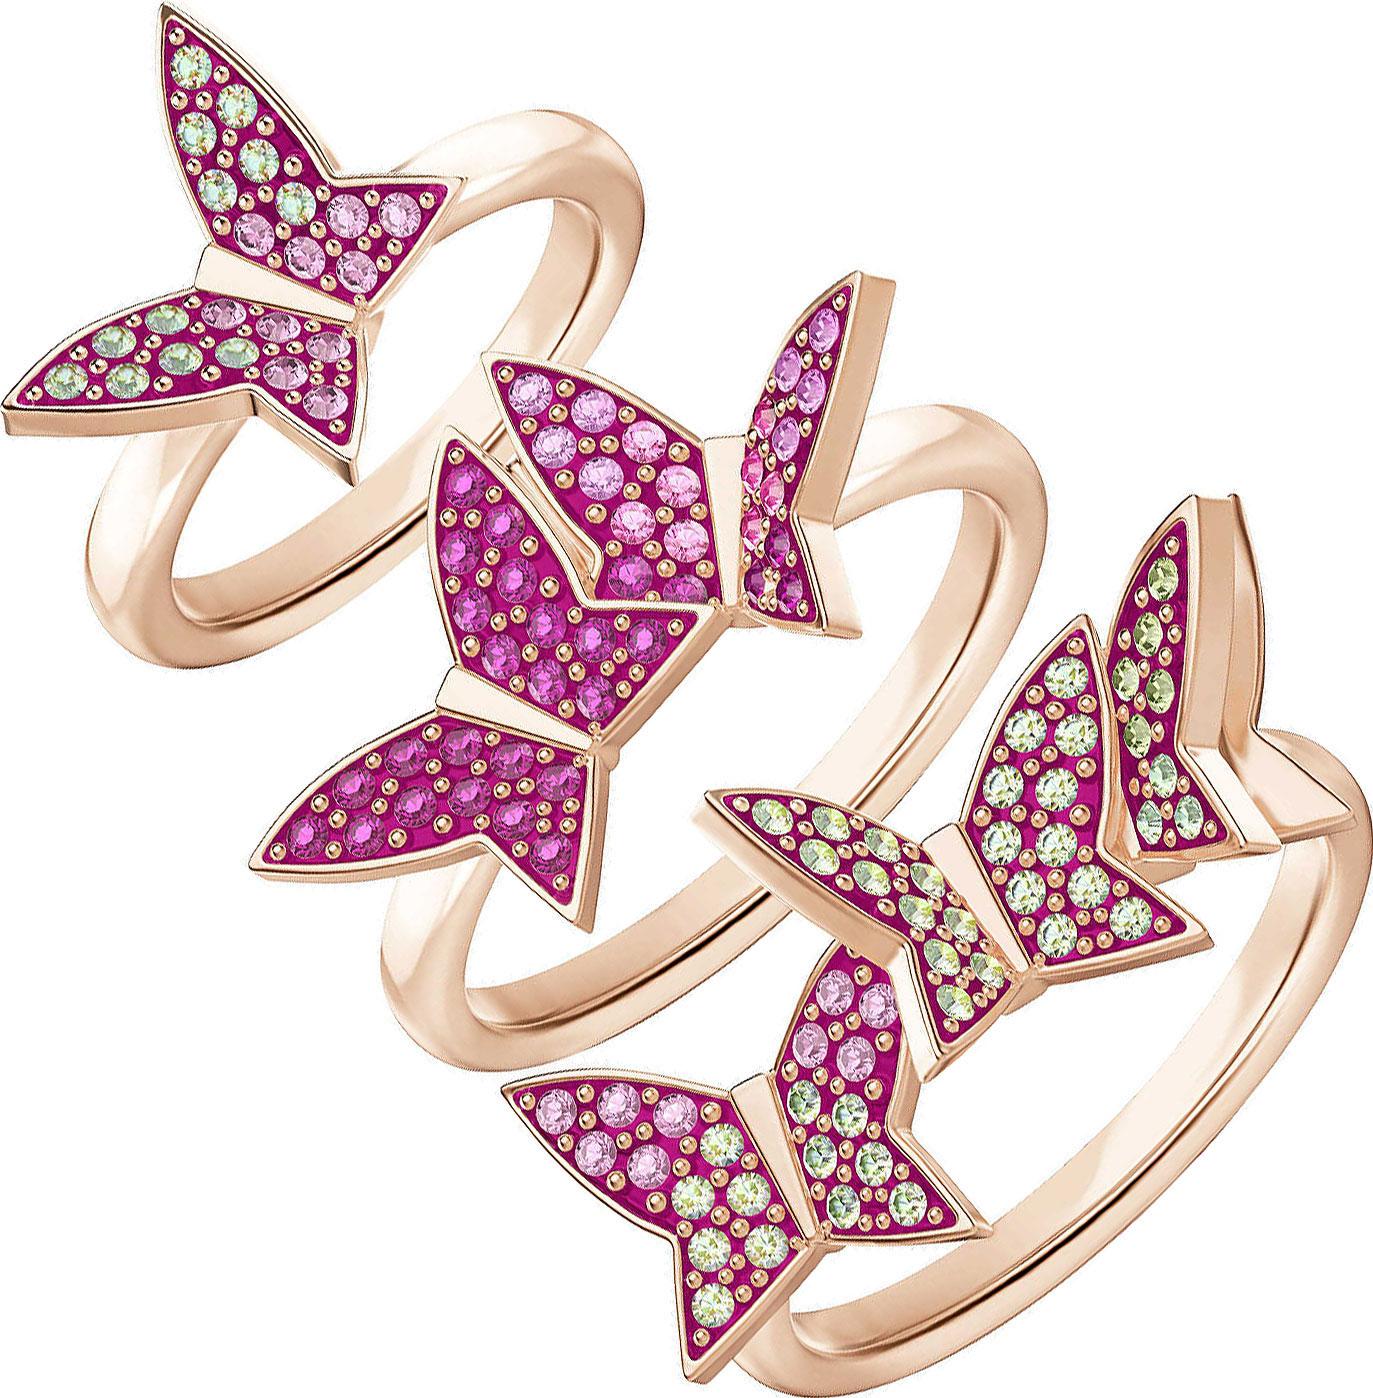 Кольца Swarovski 5384892 swarovski swarovski кольца кольца романтический элегантный минималистский аксессуары no 503291552